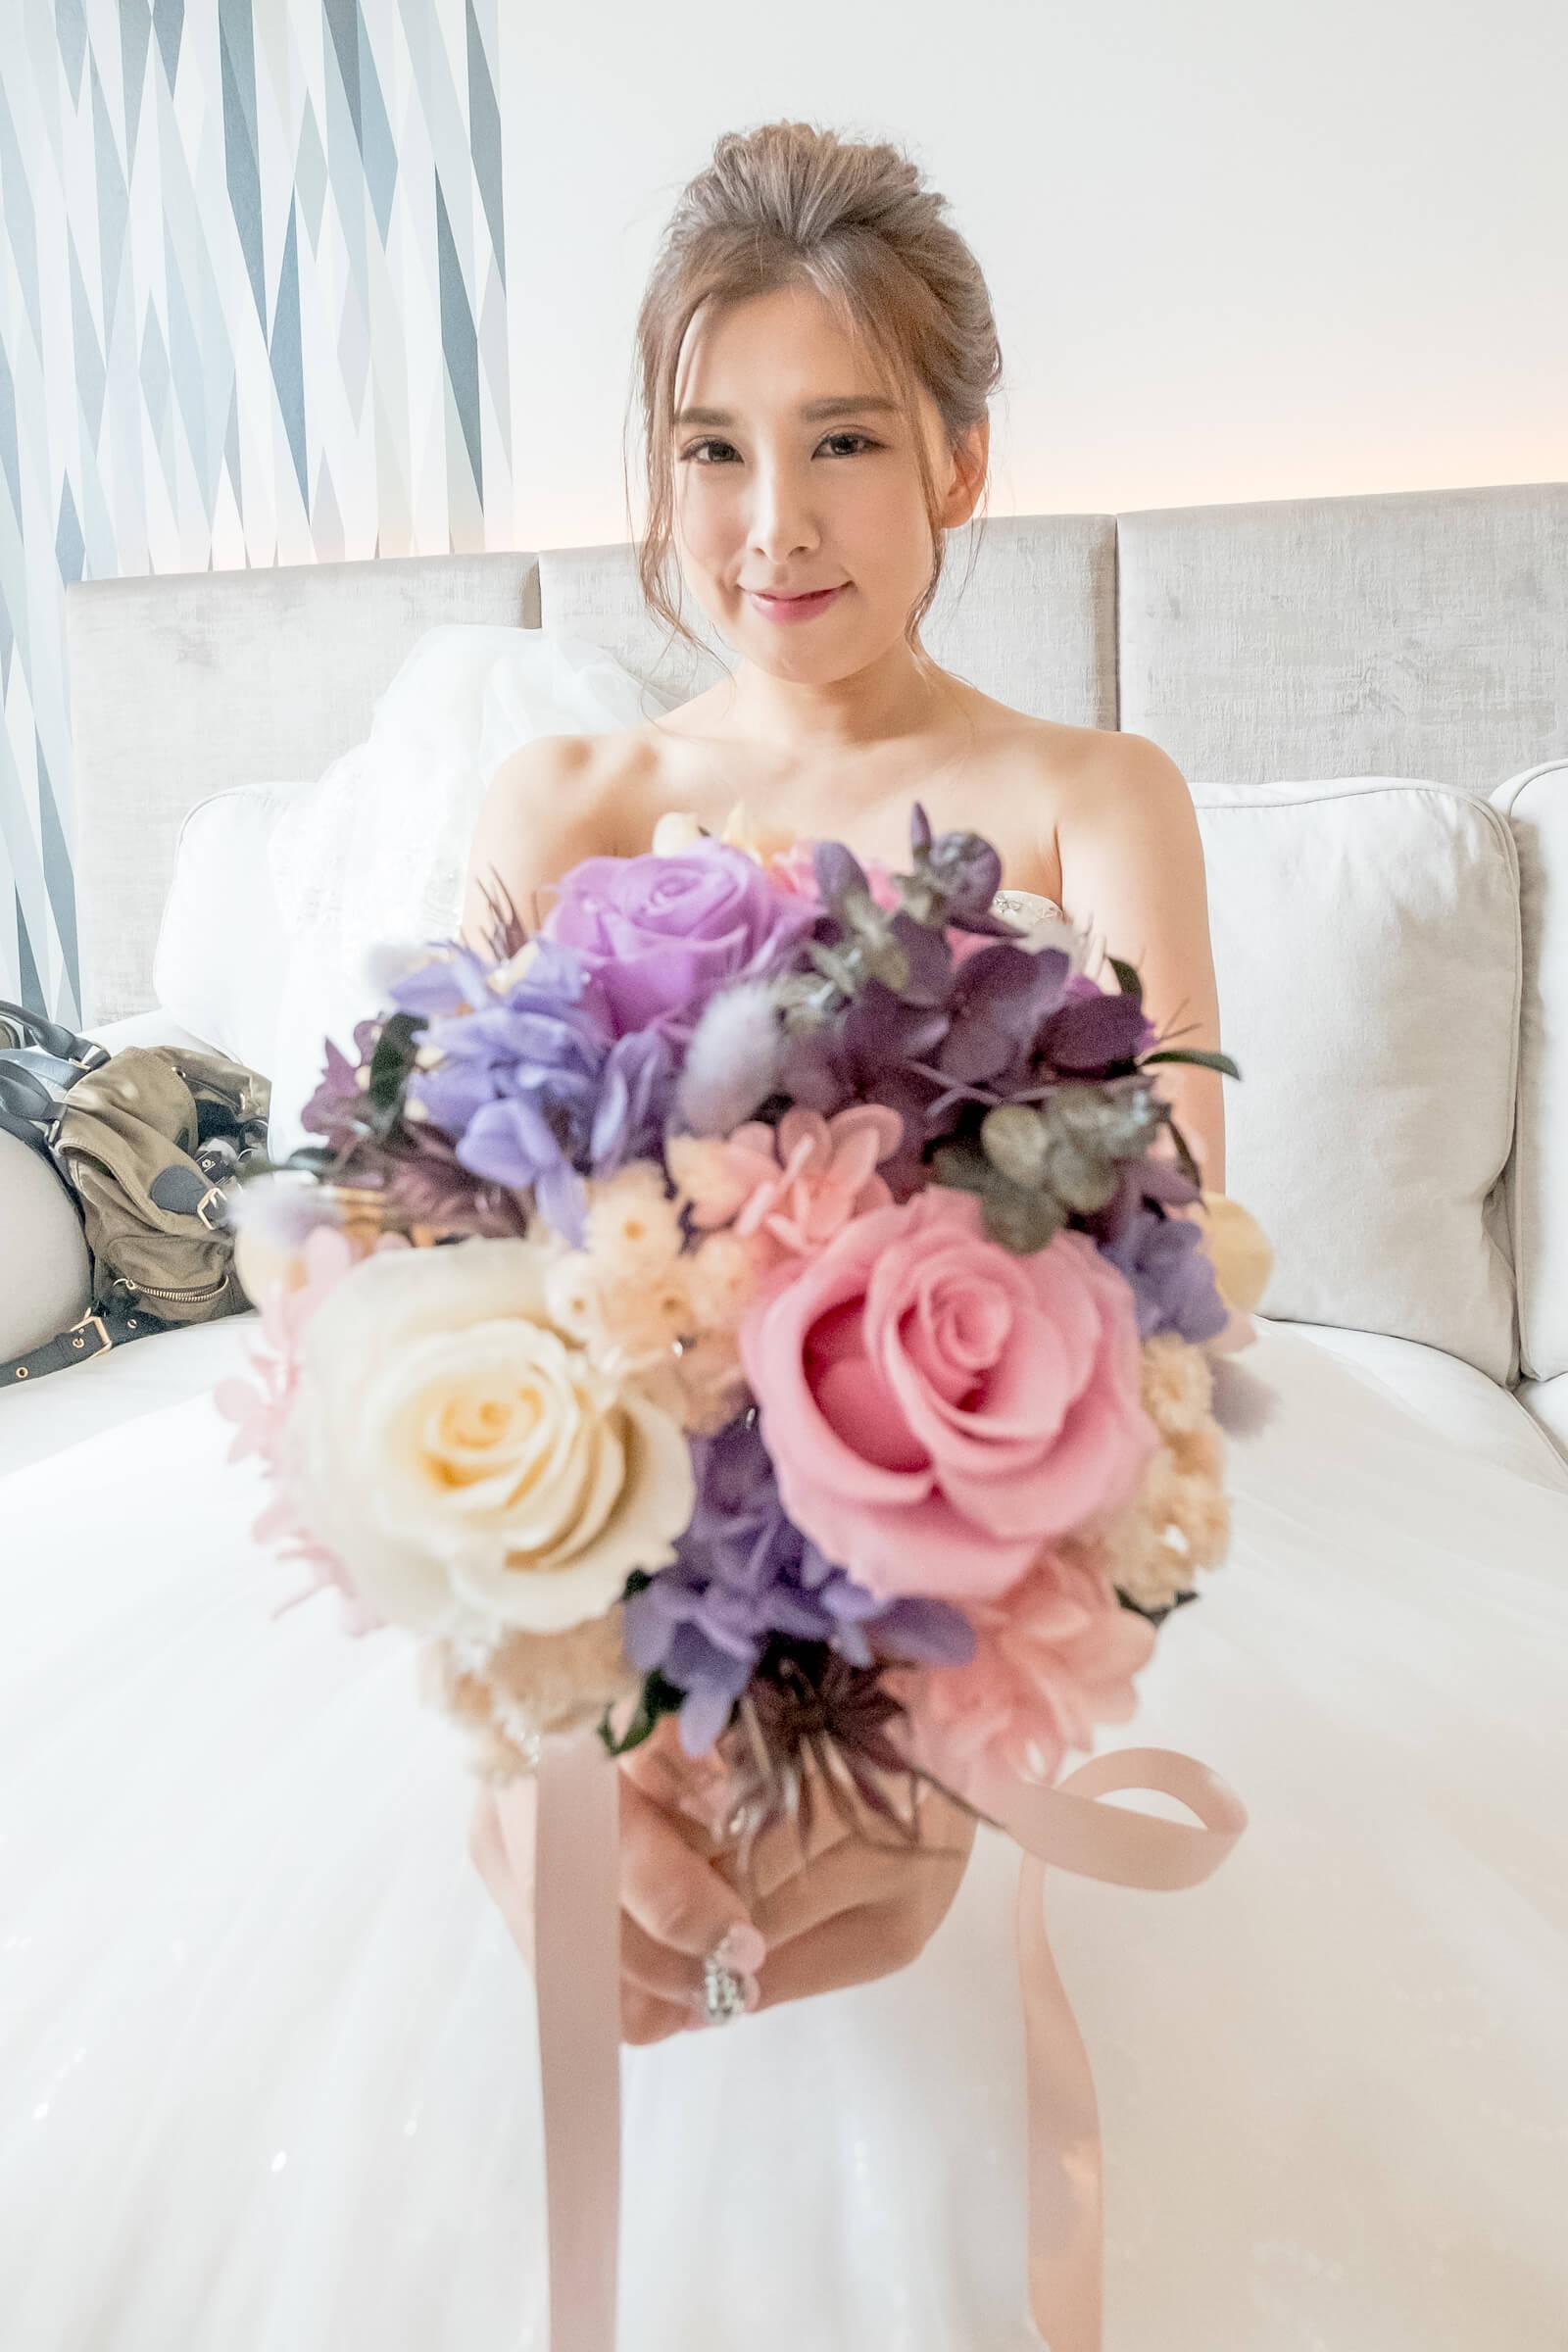 E+K 板橋凱薩飯店 錄影主+拍照輔 – 雲朵婚禮錄影|質感系台北婚錄 1